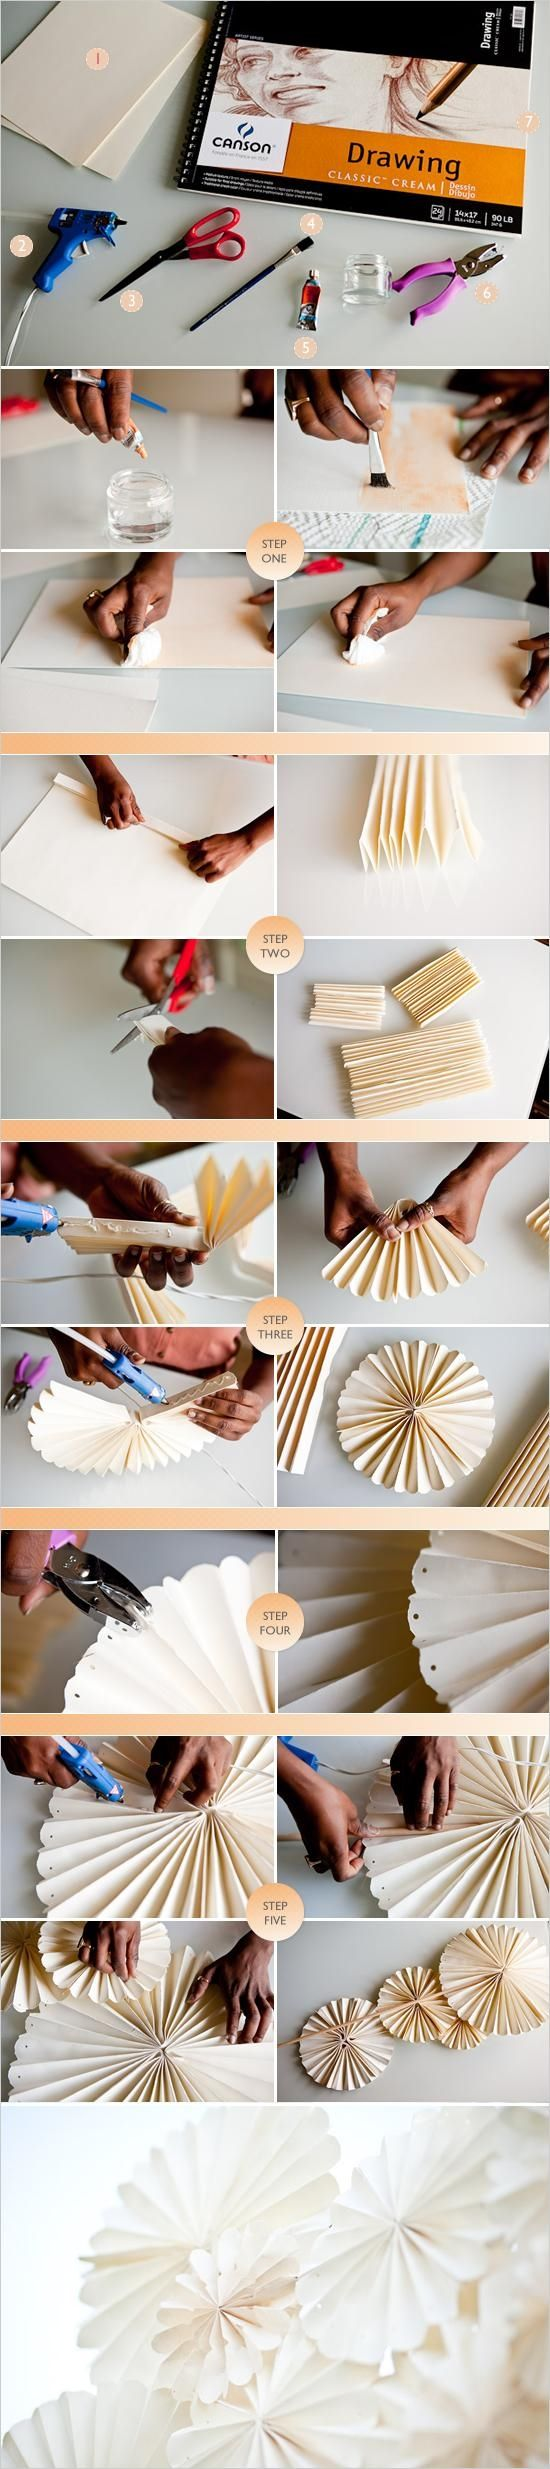 DIY Pinwheels diy crafts home made easy crafts craft idea crafts ideas diy ideas diy crafts diy idea do it yourself diy projects diy craft handmade pinwheels home decorations